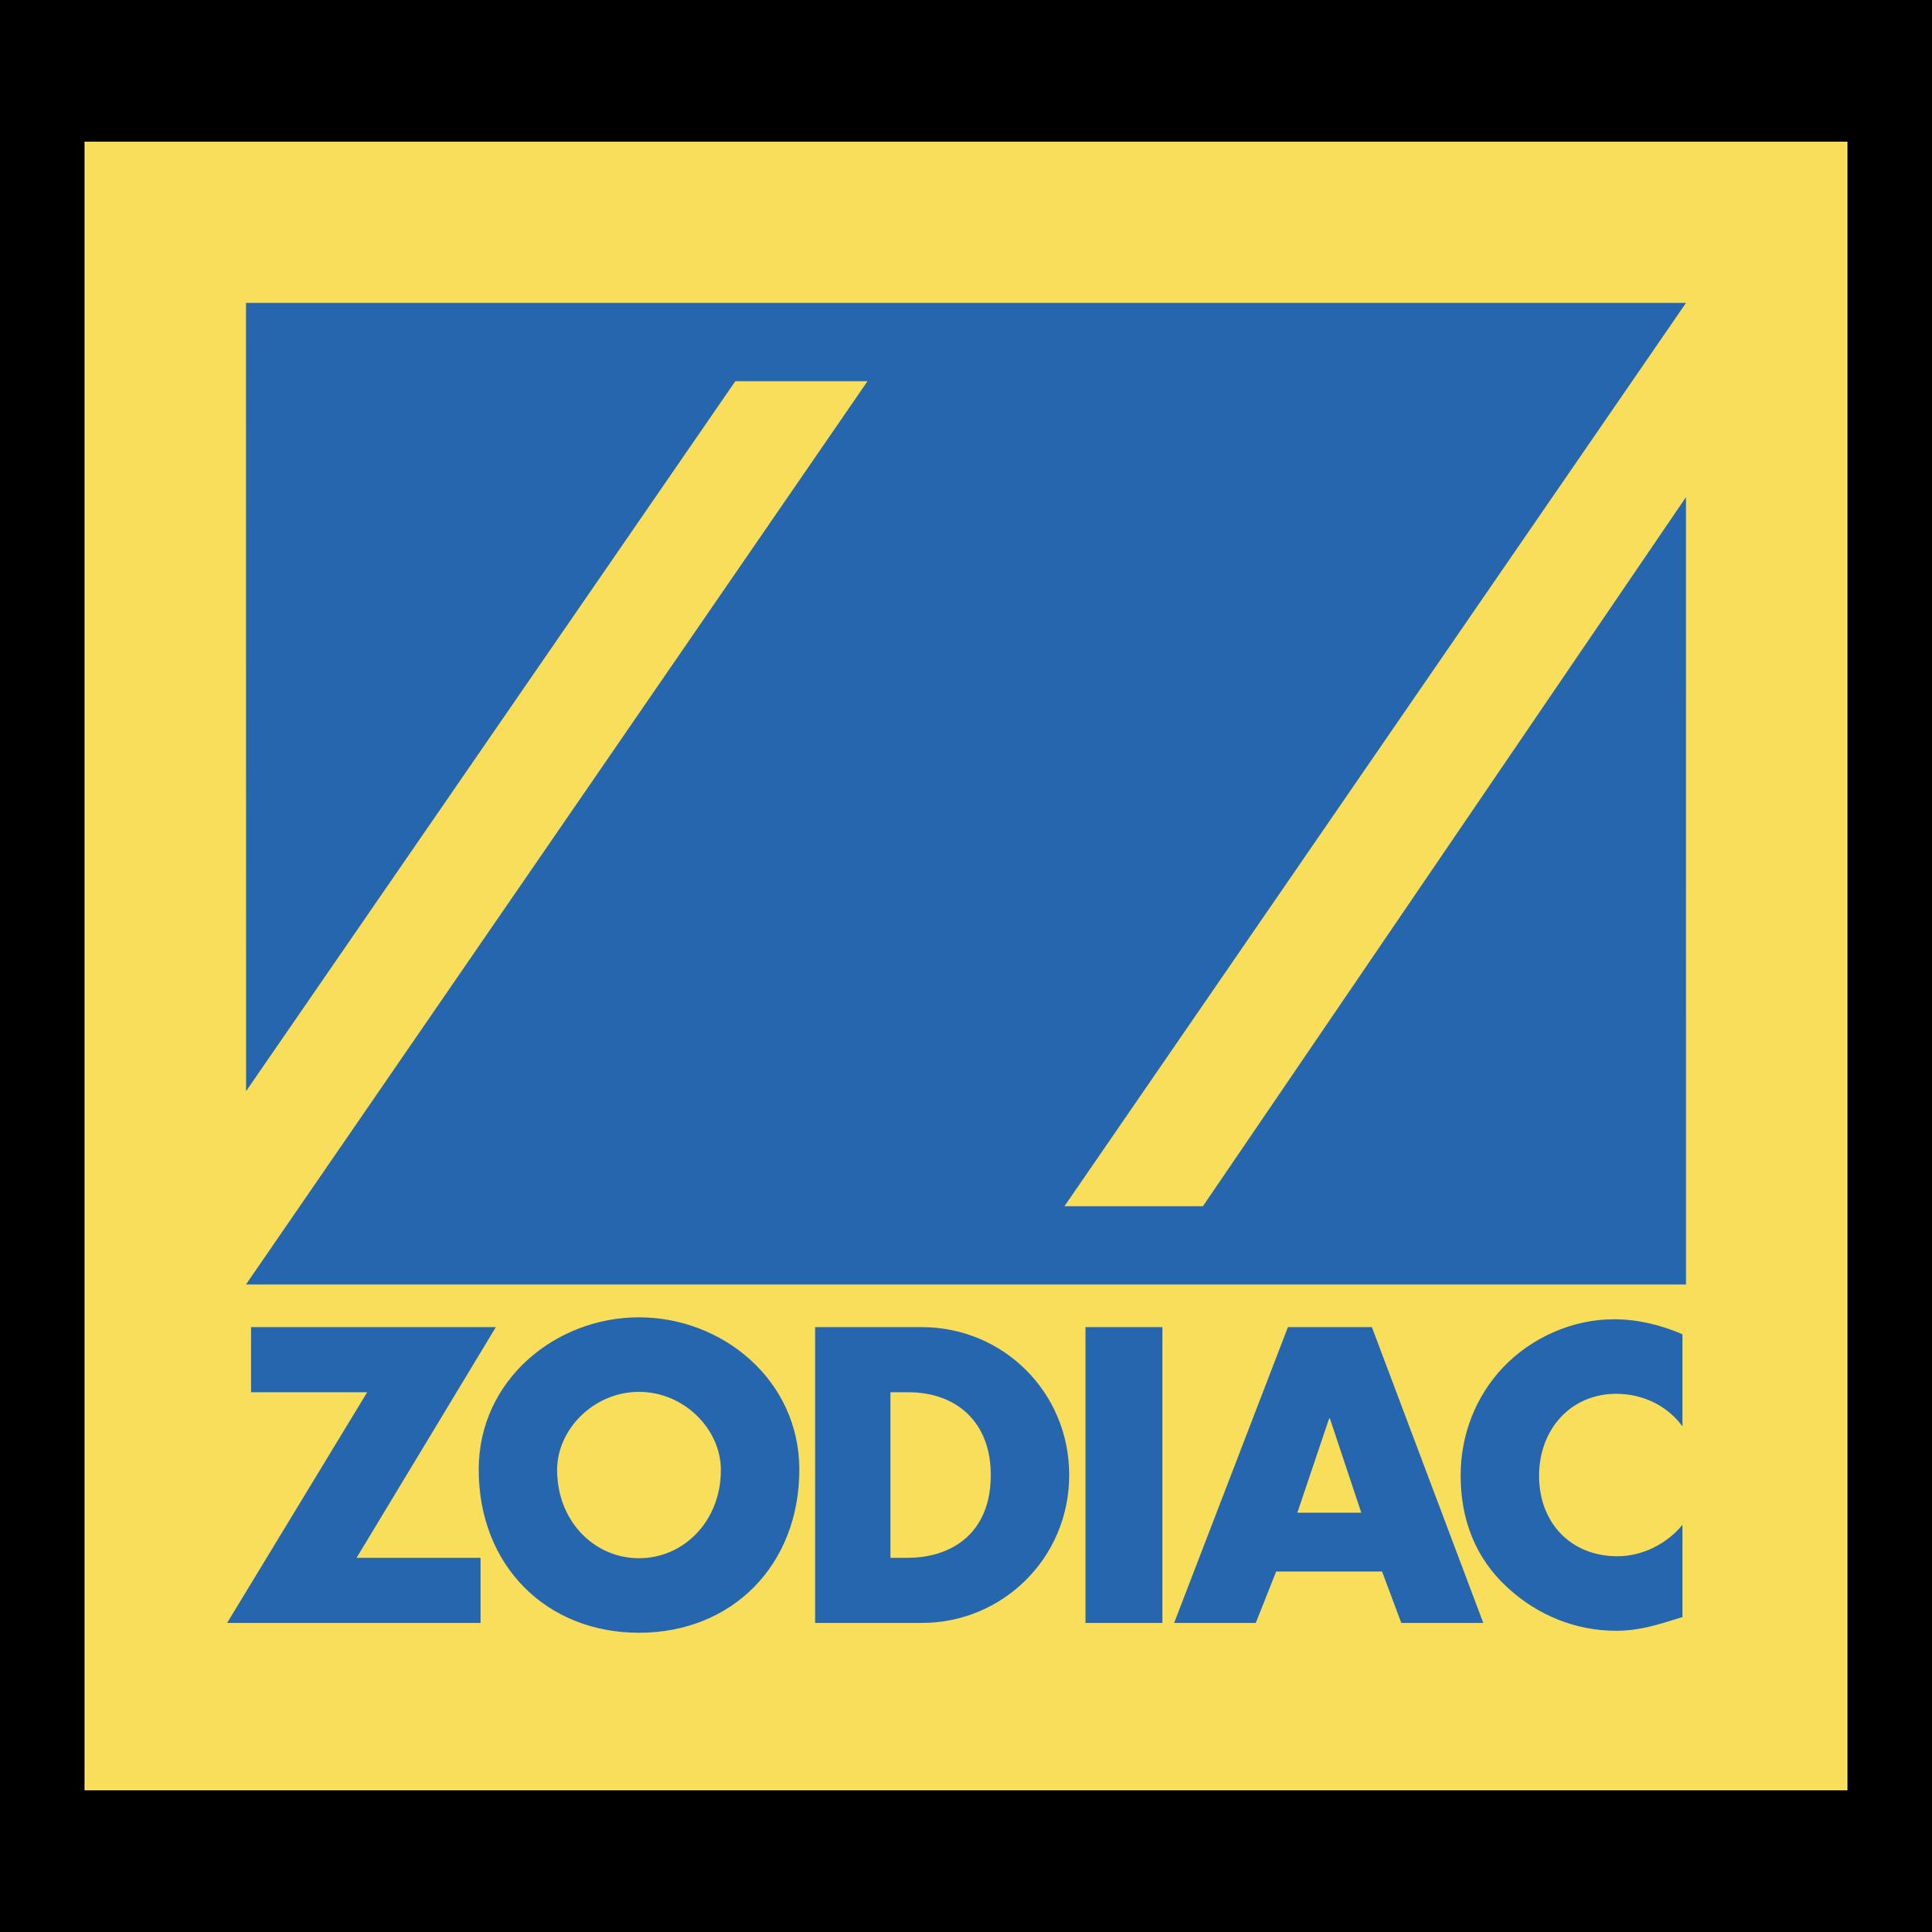 Zodiac Logo PNG Transparent & SVG Vector.